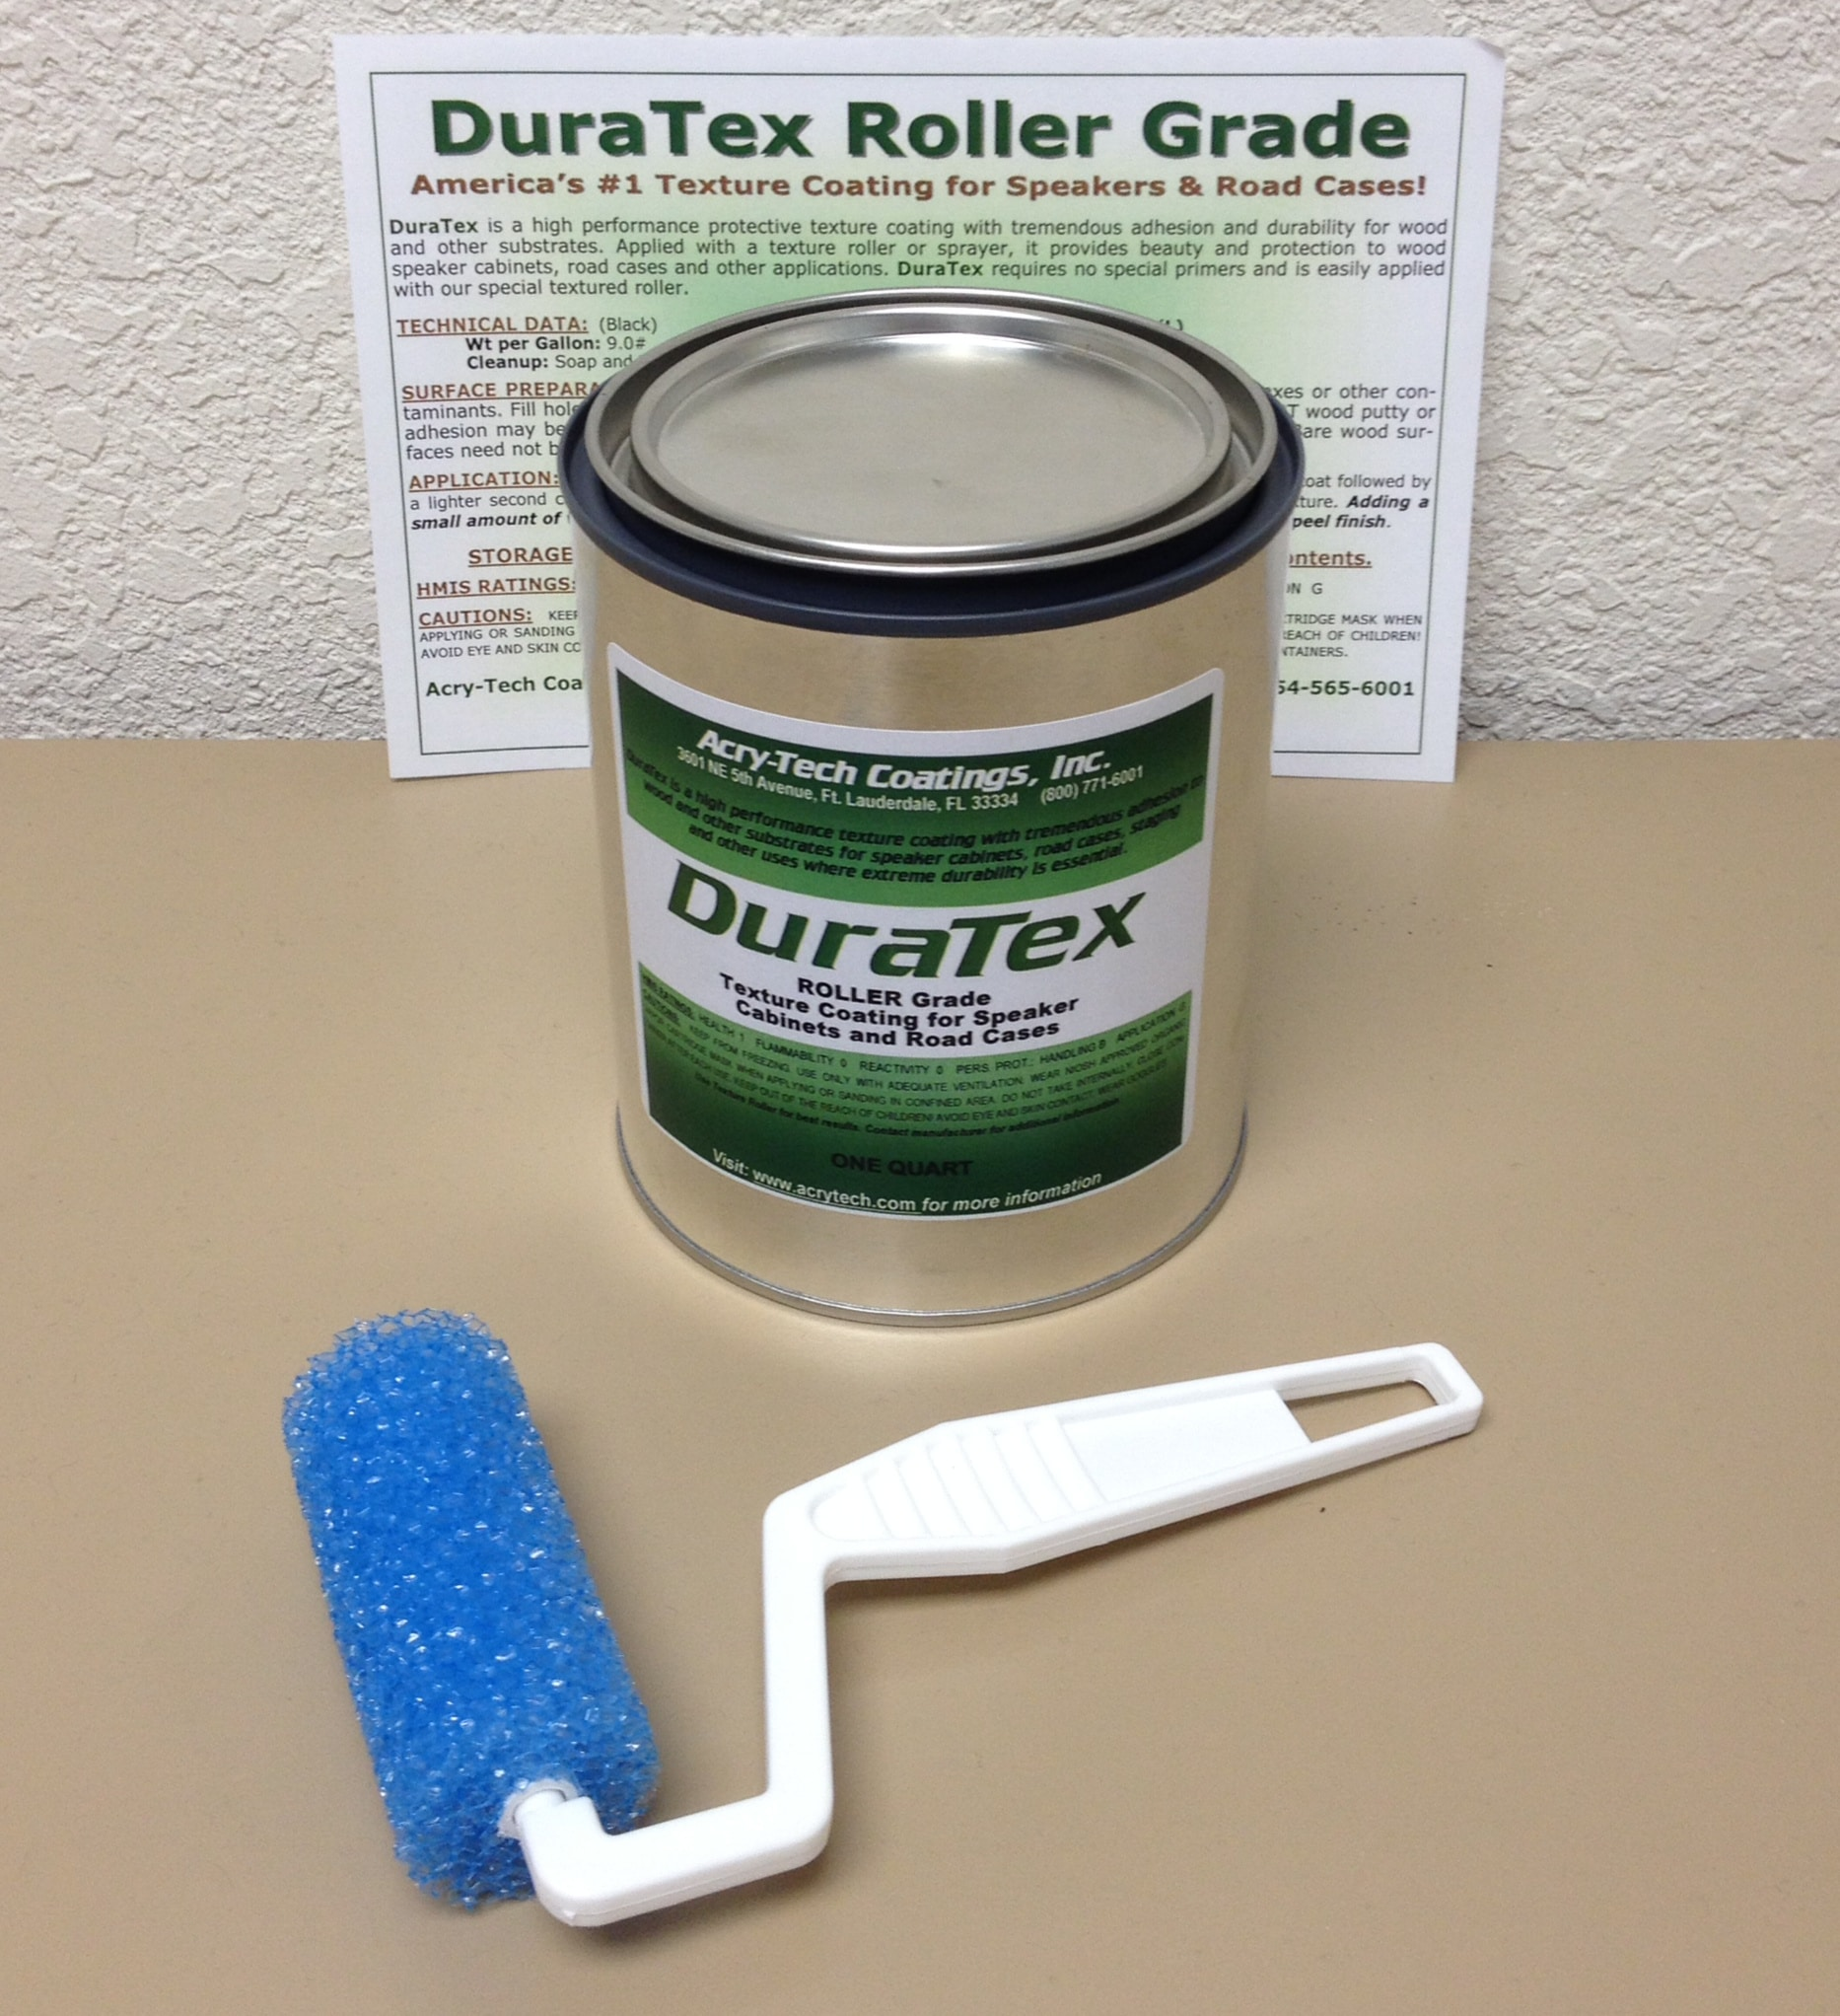 DuraTex Speaker Cabinet Texture Coating 1 Quart Roller Grade Ultra ...